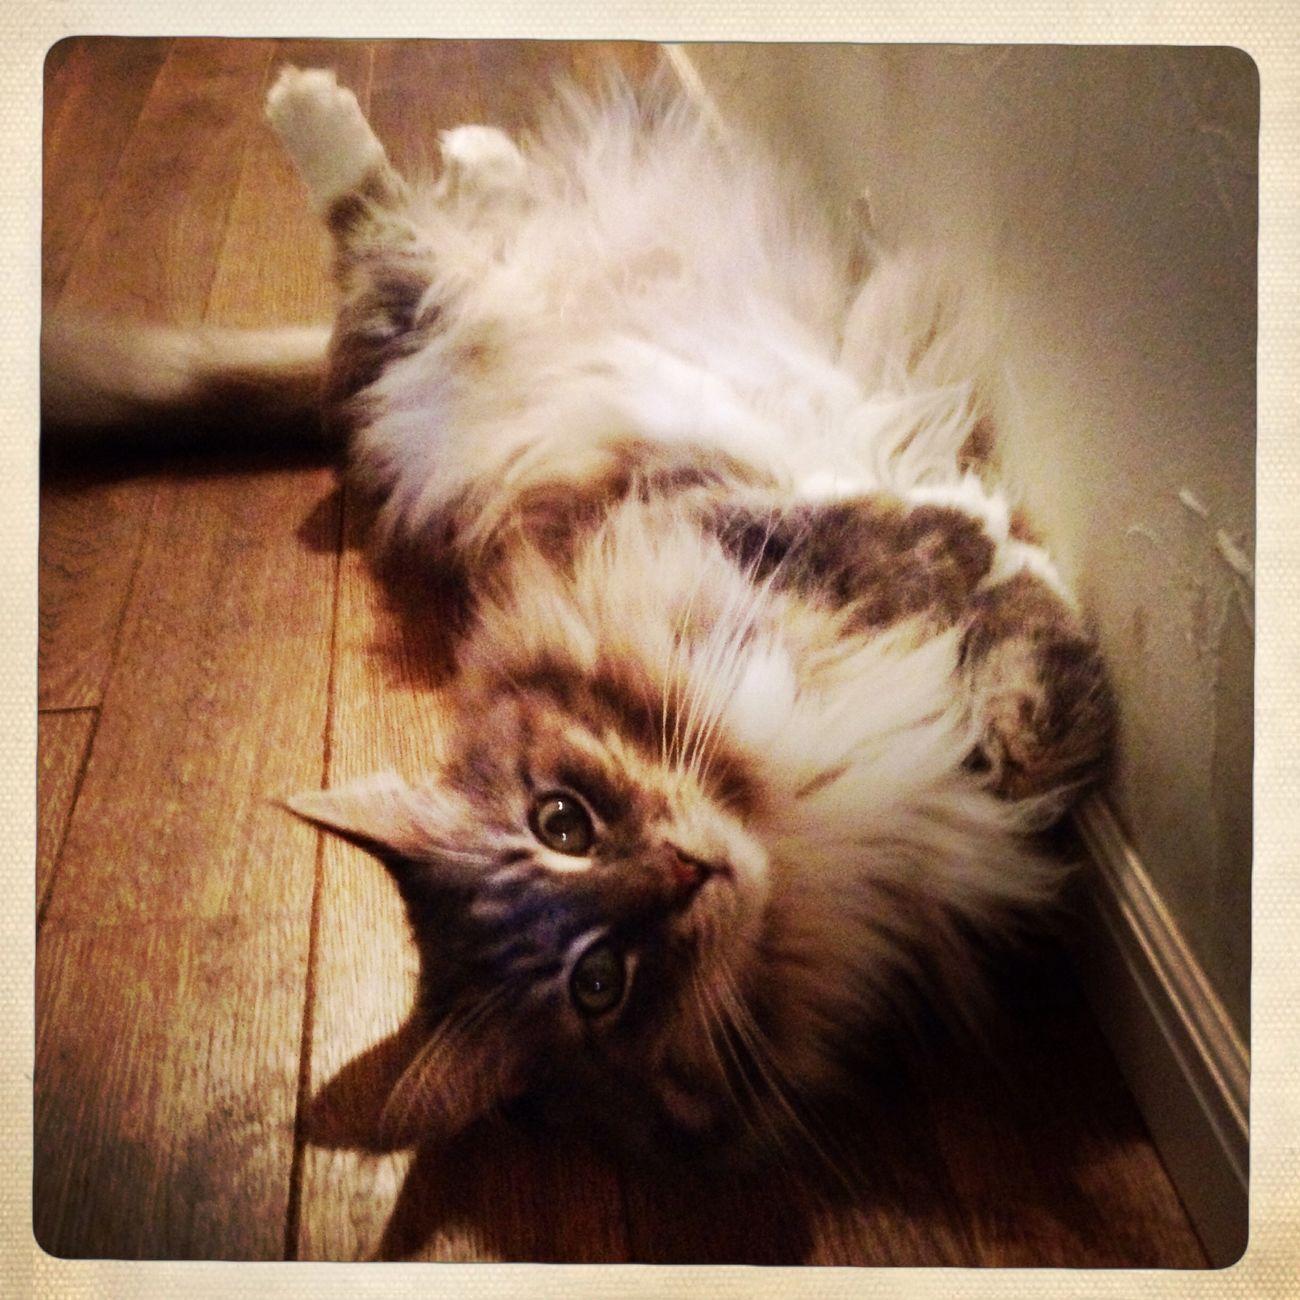 Cat Main Kuhn Pretty ねこ くぅ 可愛い